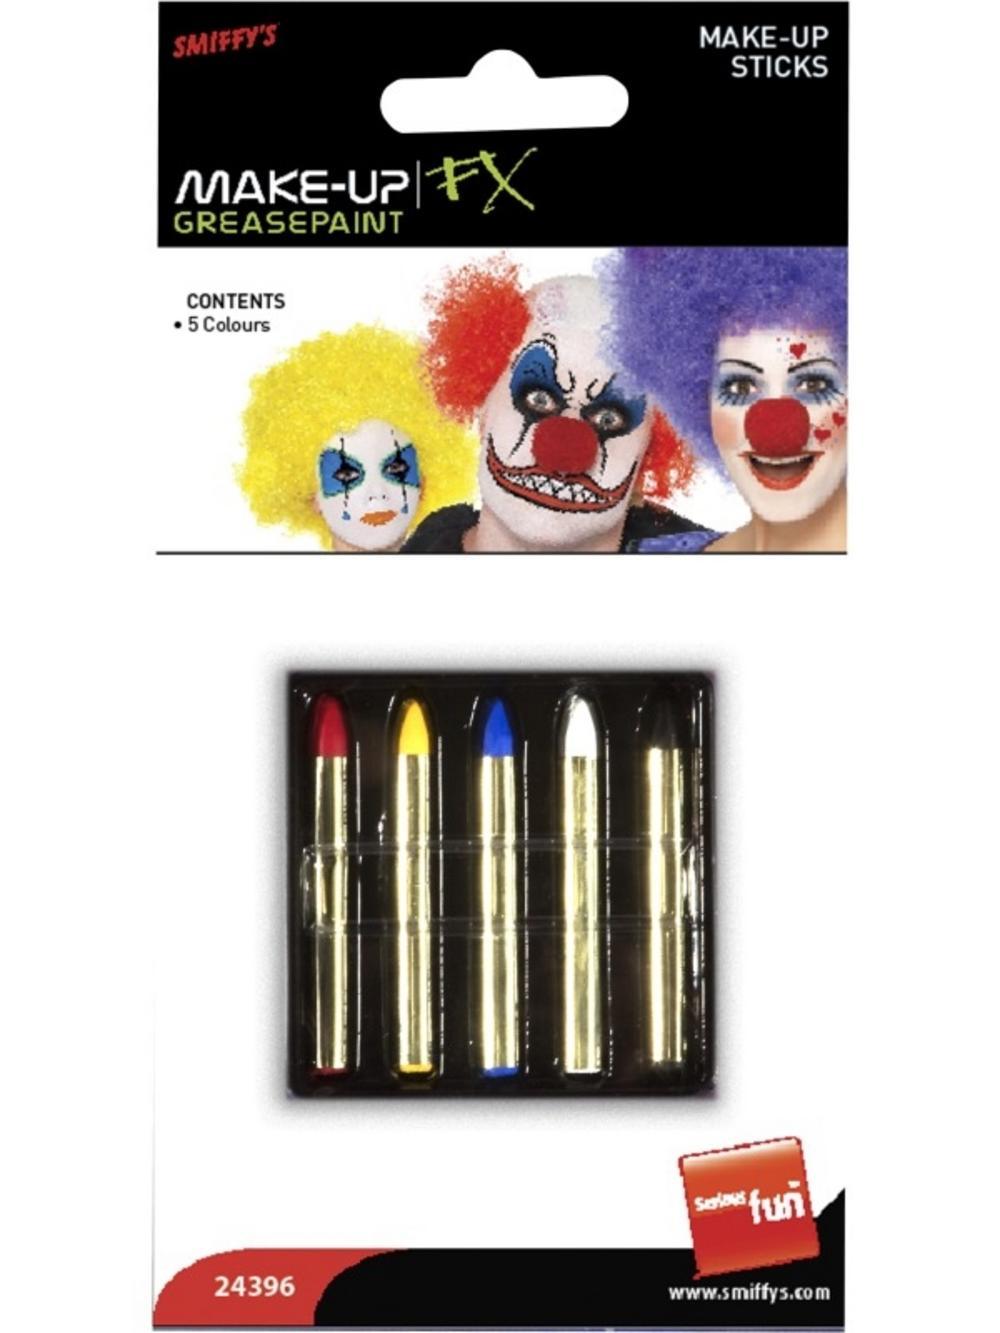 Coloured Make Up sticks